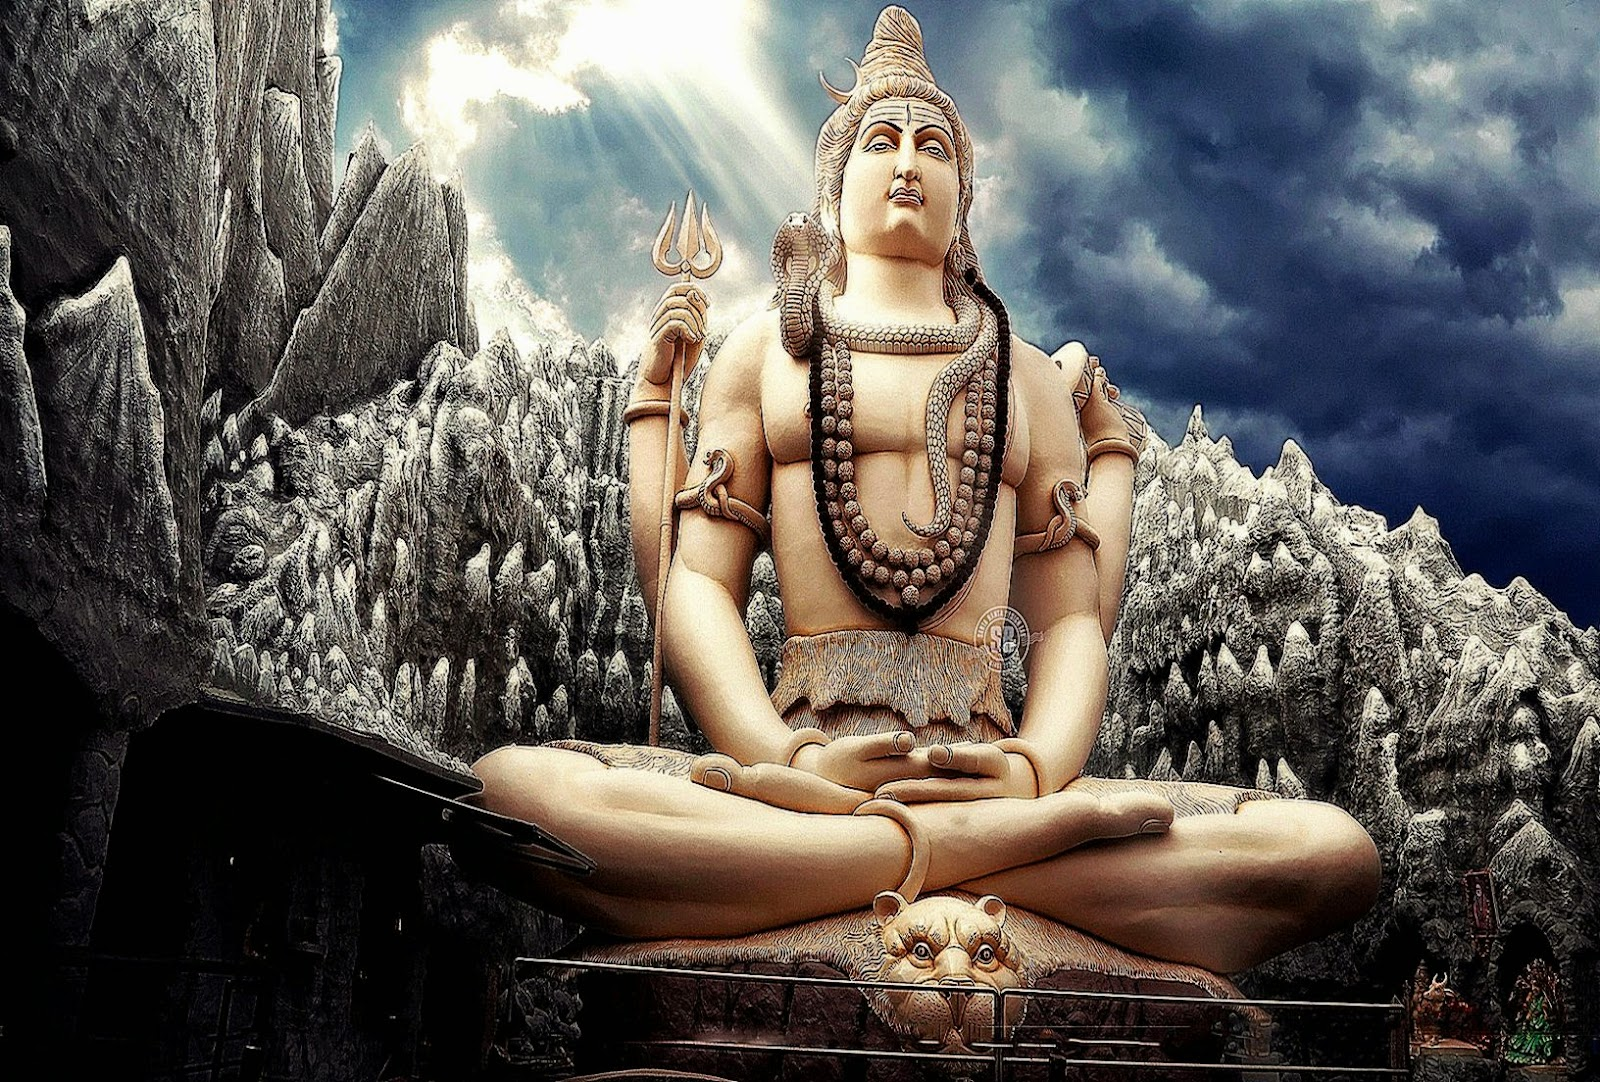 Lord Shiva As Ardhanareeswara Beautiful Hd Wallpapers For: Lord Shiva Wallpaper Hd